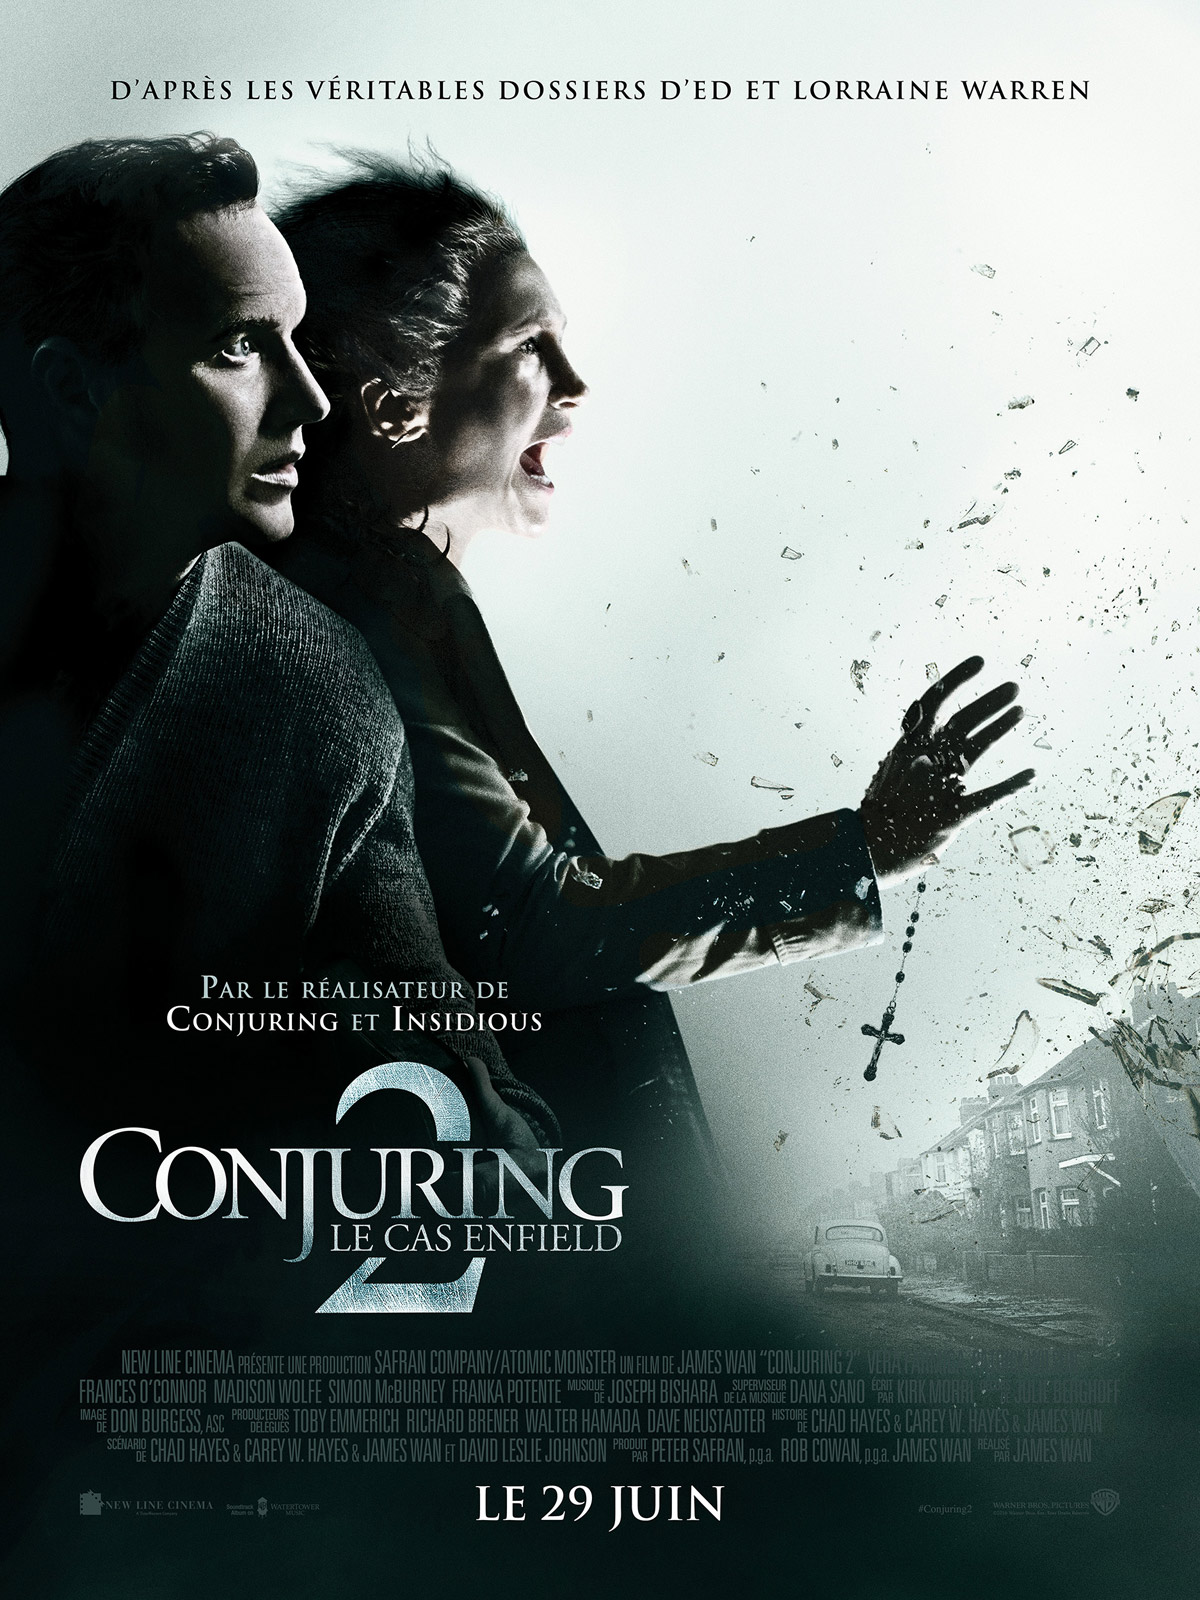 Conjuring 2 : Le Cas Enfield ddl